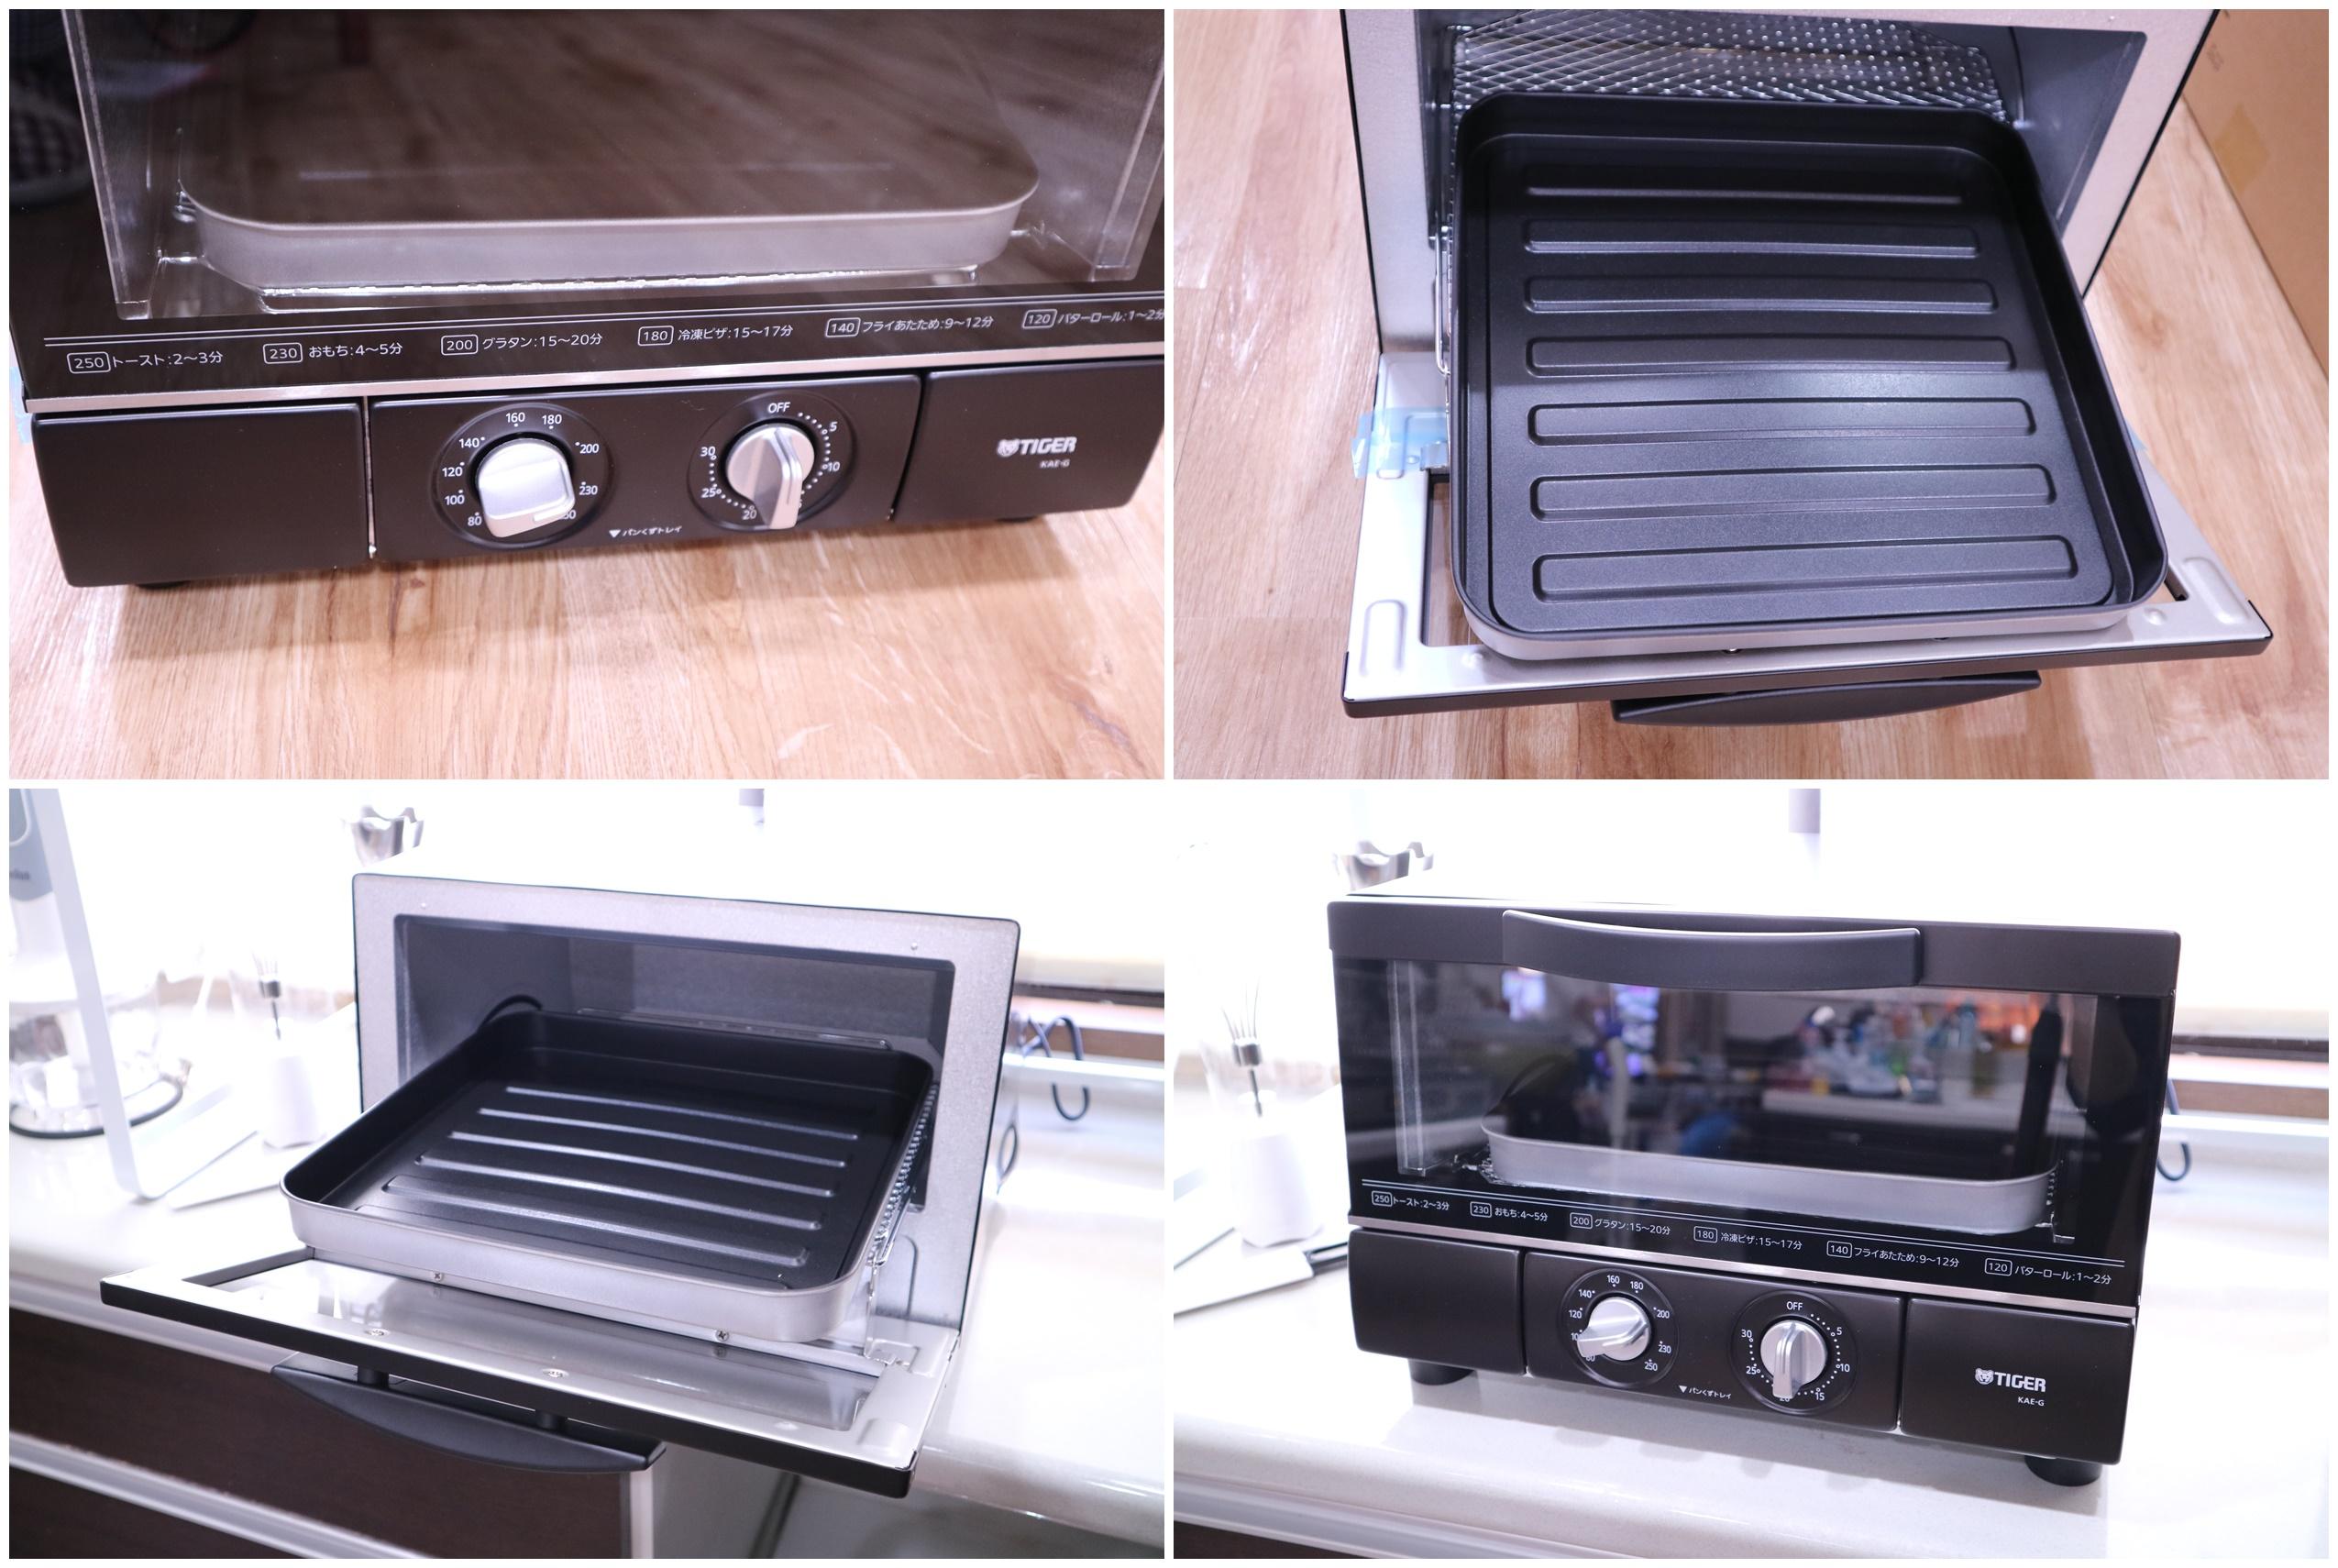 Tiger虎牌高火力烤箱